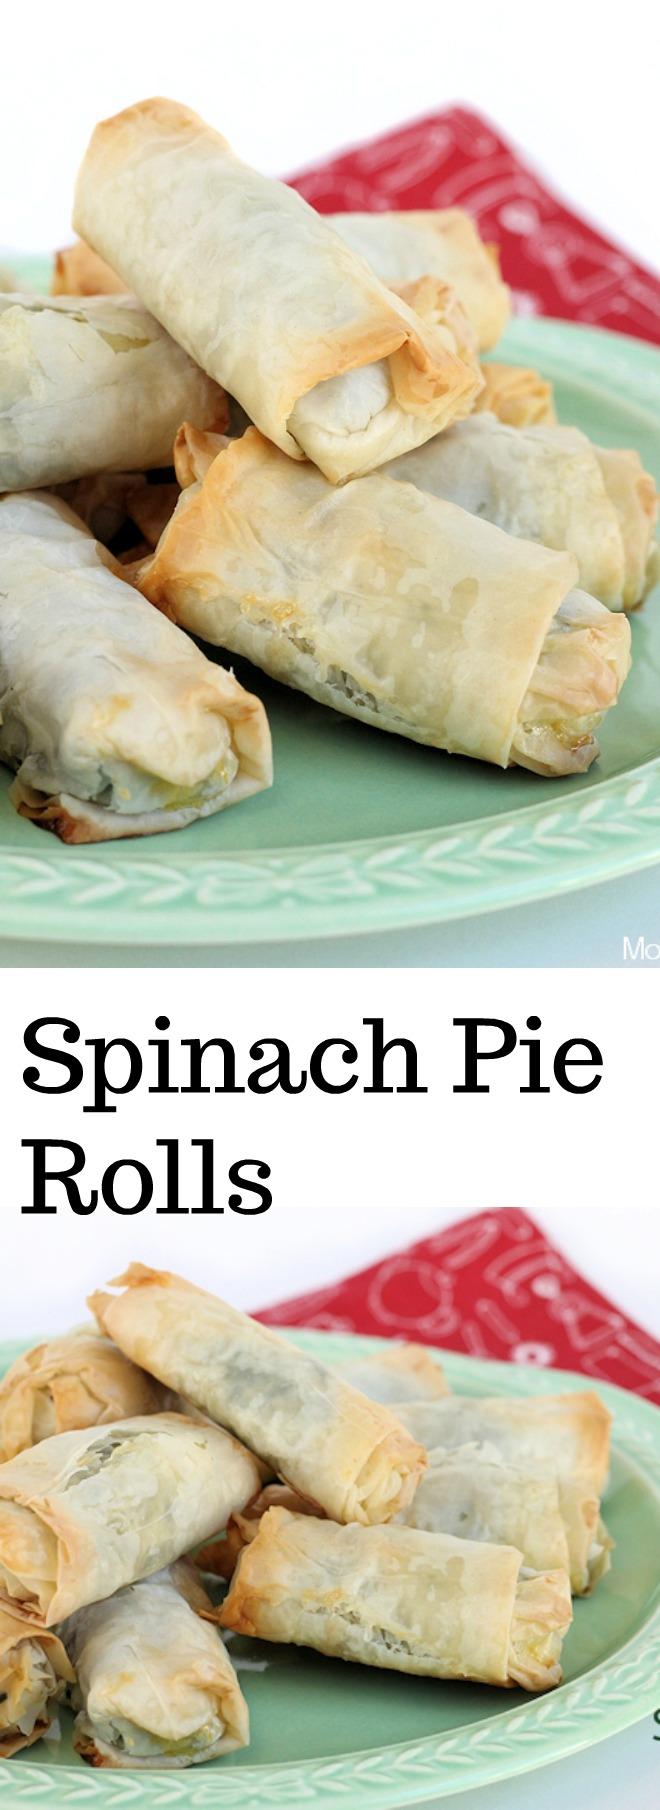 Spinach Pie Rolls - appetizer recipe